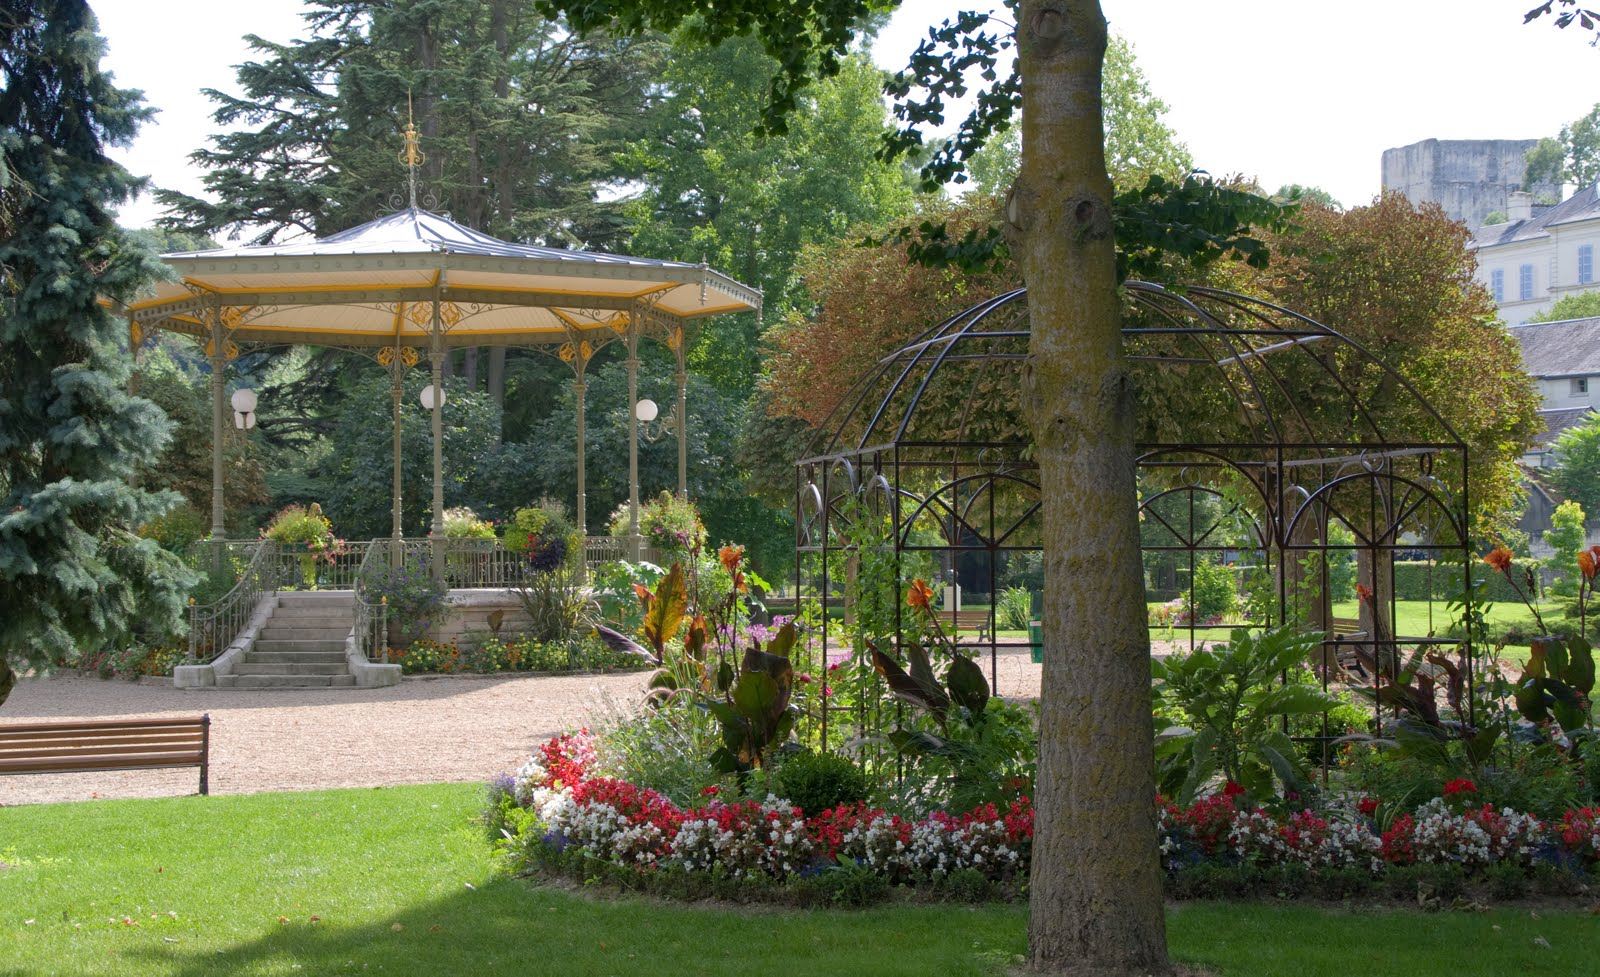 Blogaventure loira castillos y jardines for Jardines romanticos